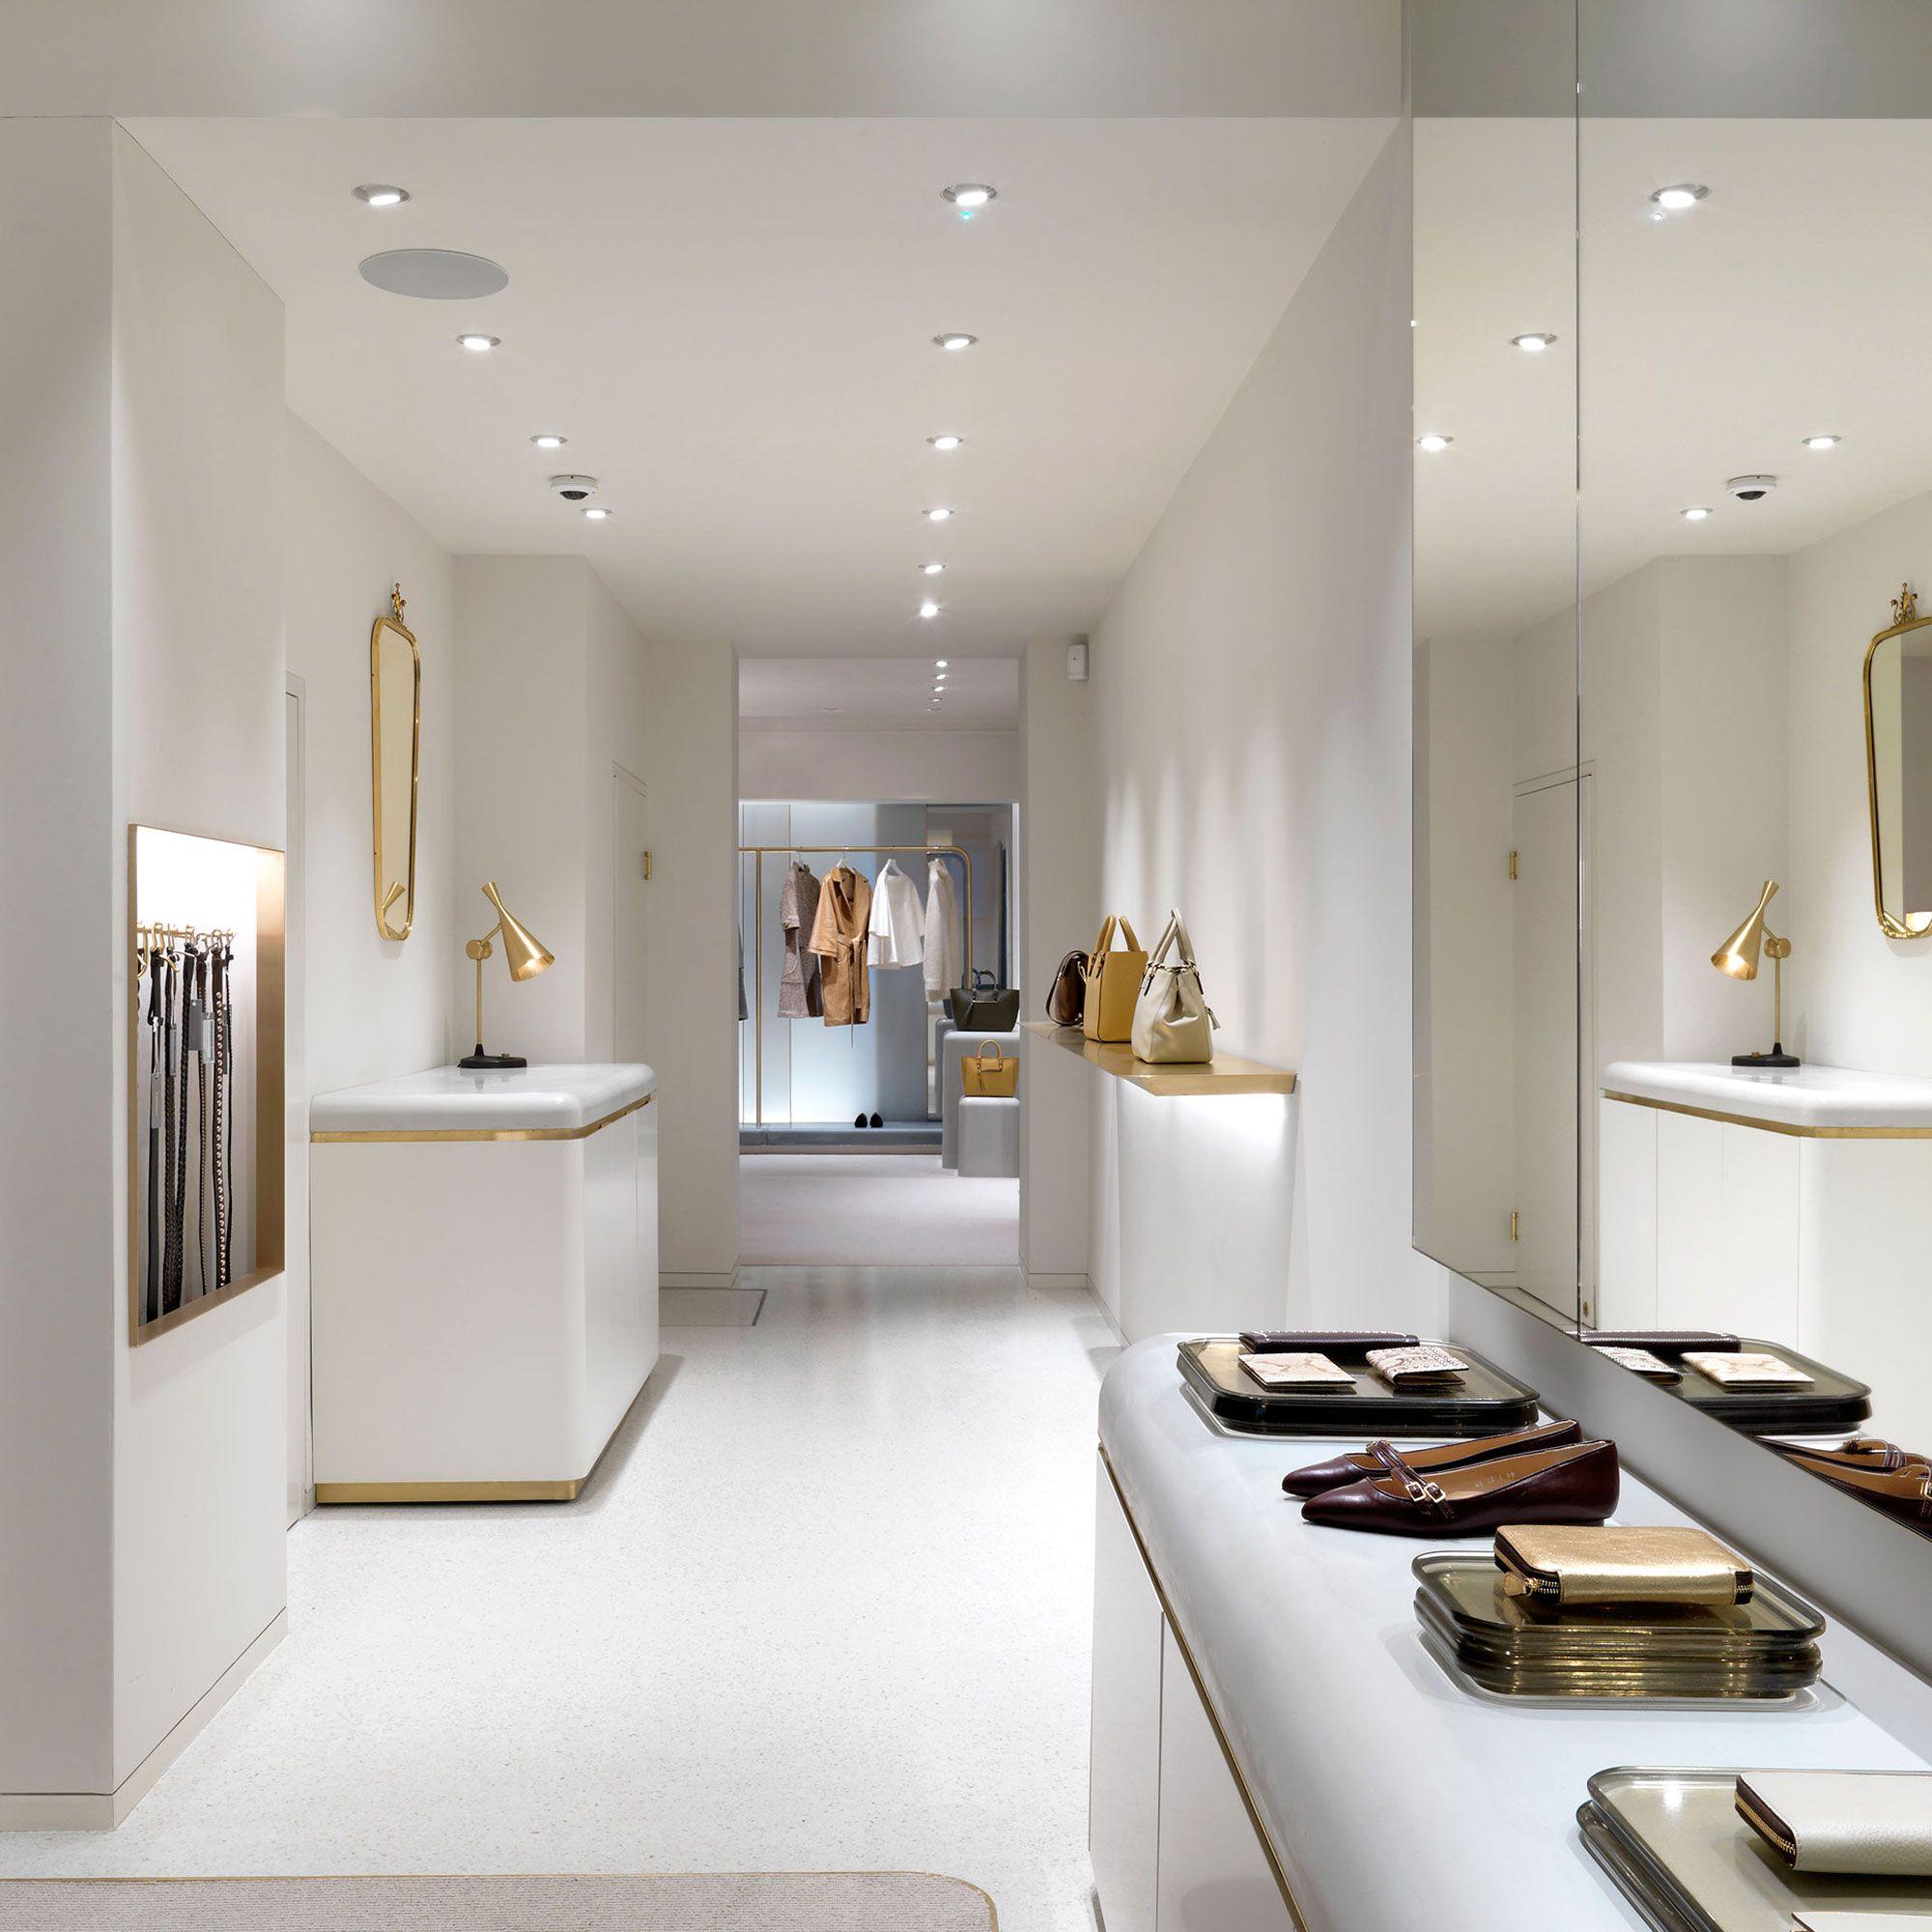 J M Davidson Showroom Interior Design Retail Interior Design Design Studio London